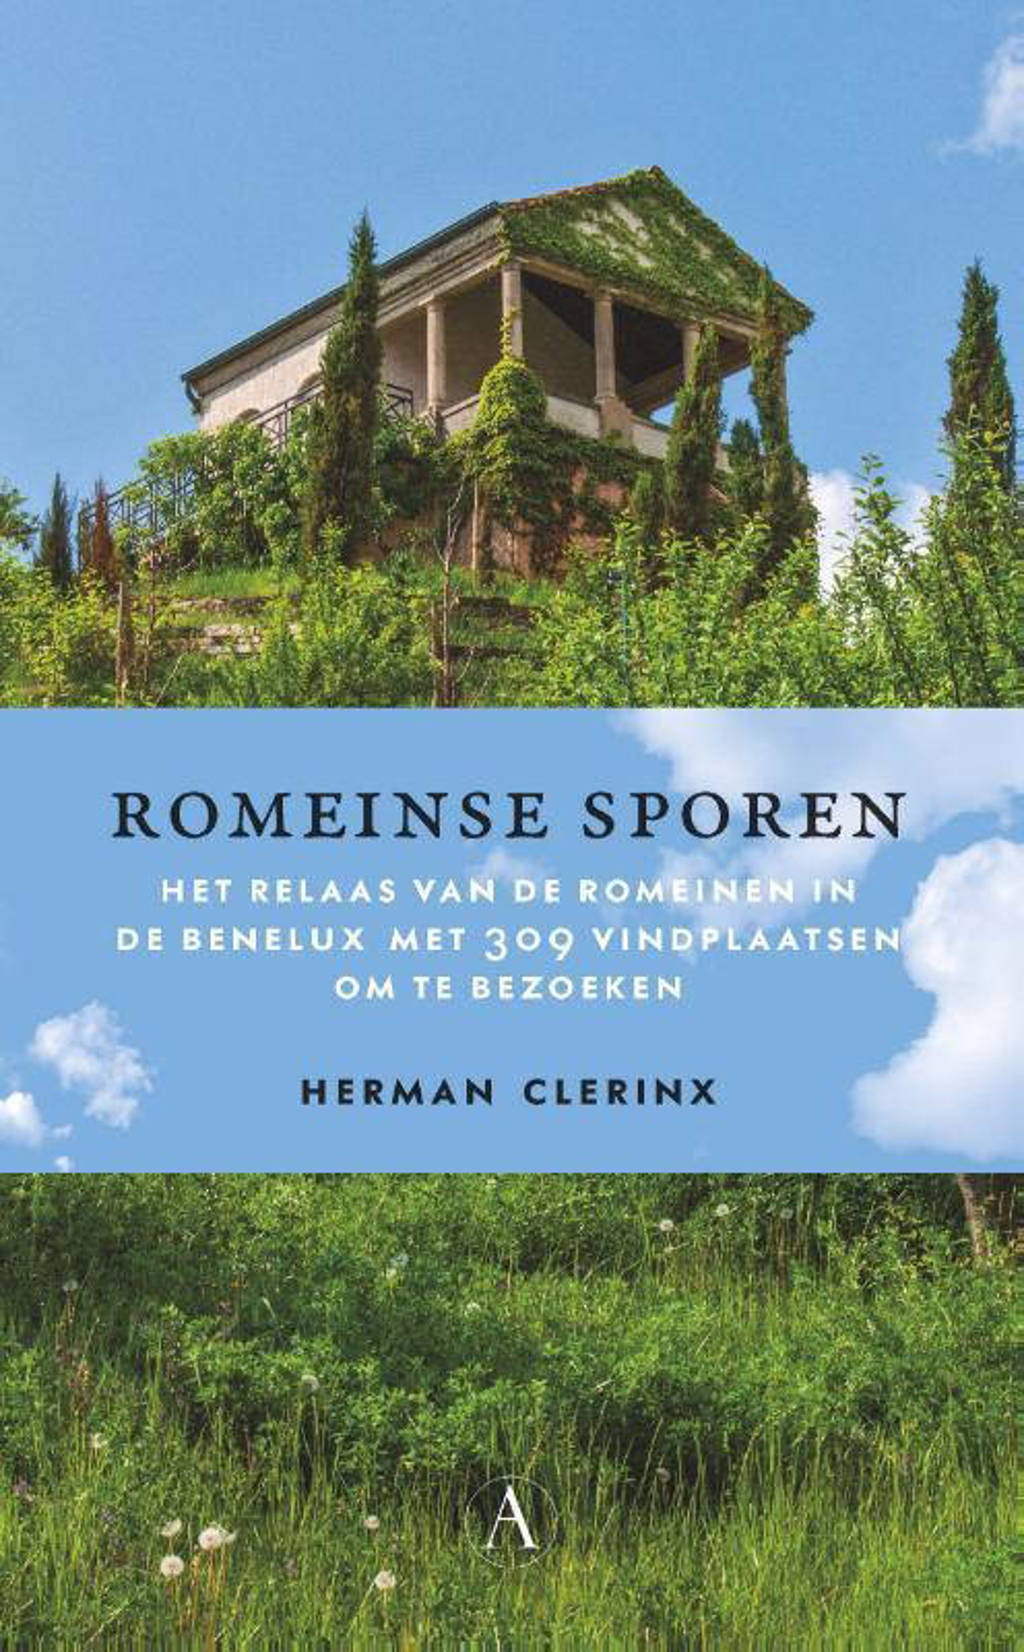 Romeinse sporen - Herman Clerinx